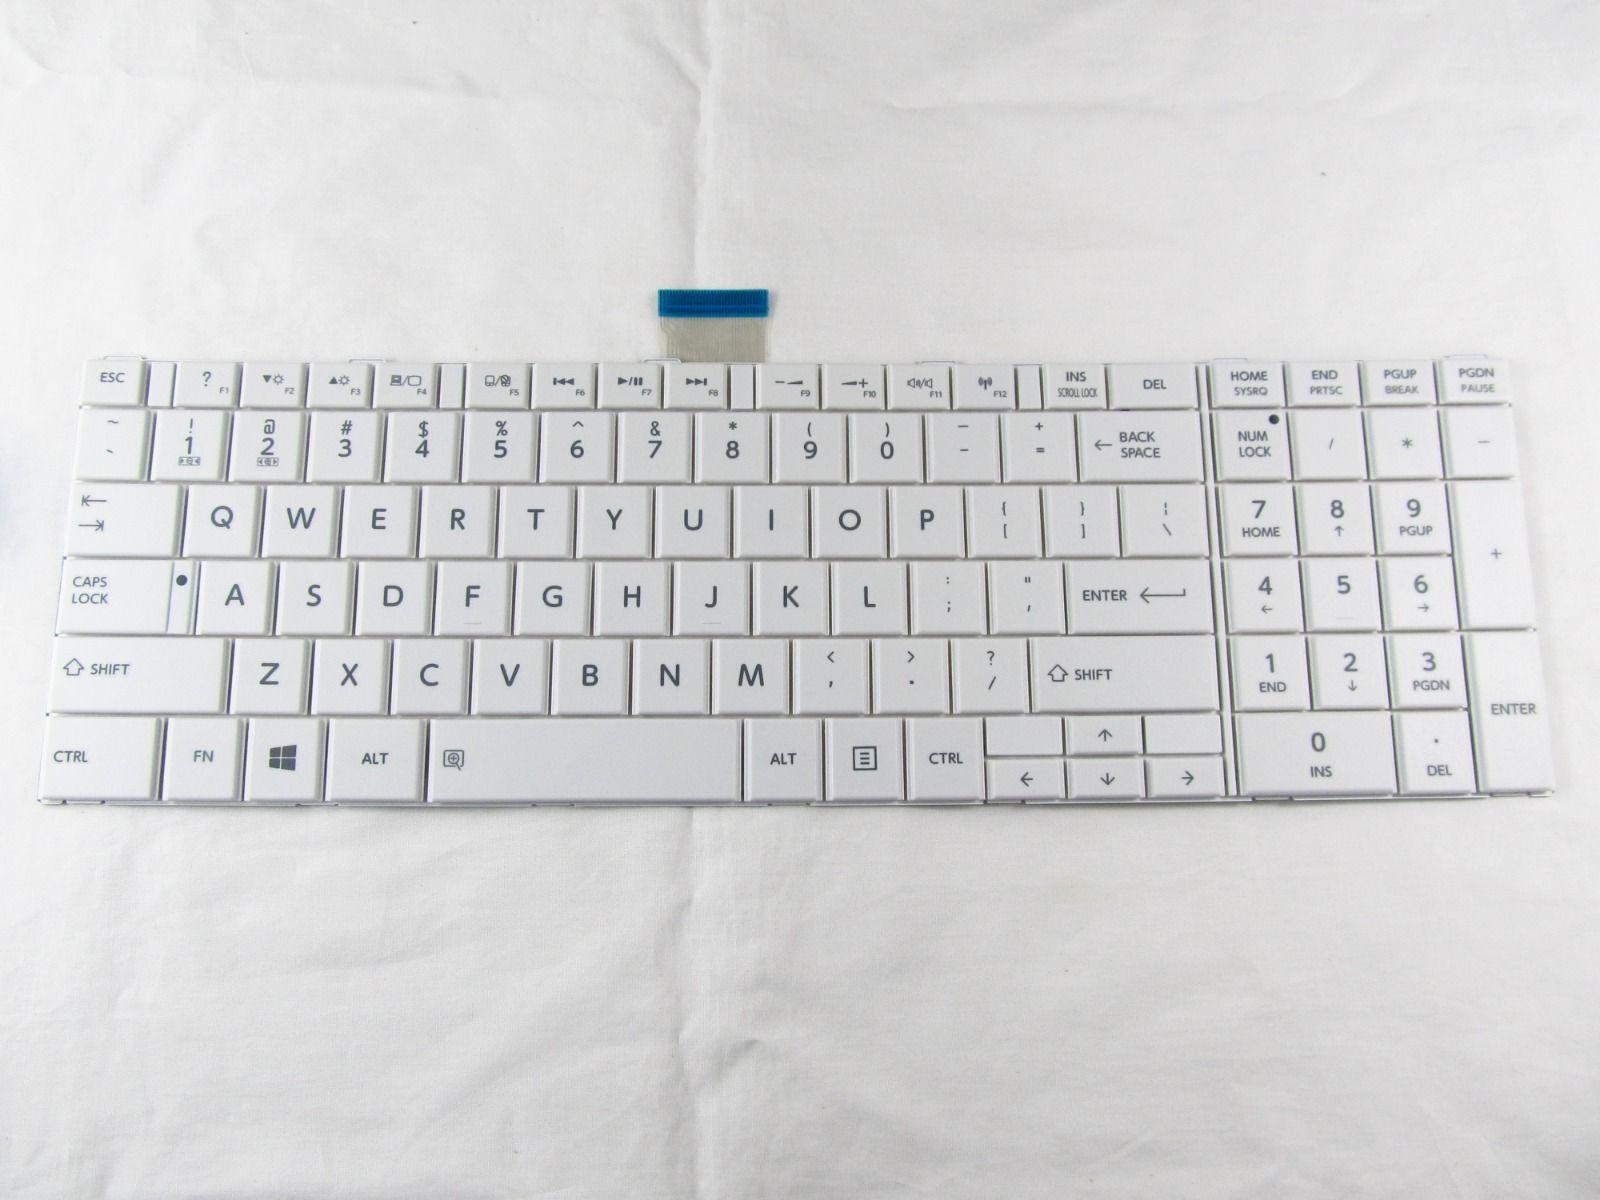 1TB 2.5 Laptop Hard Drive for Toshiba Satellite M205-S4804 M205-S4805 M205-S4806 M205-S7452